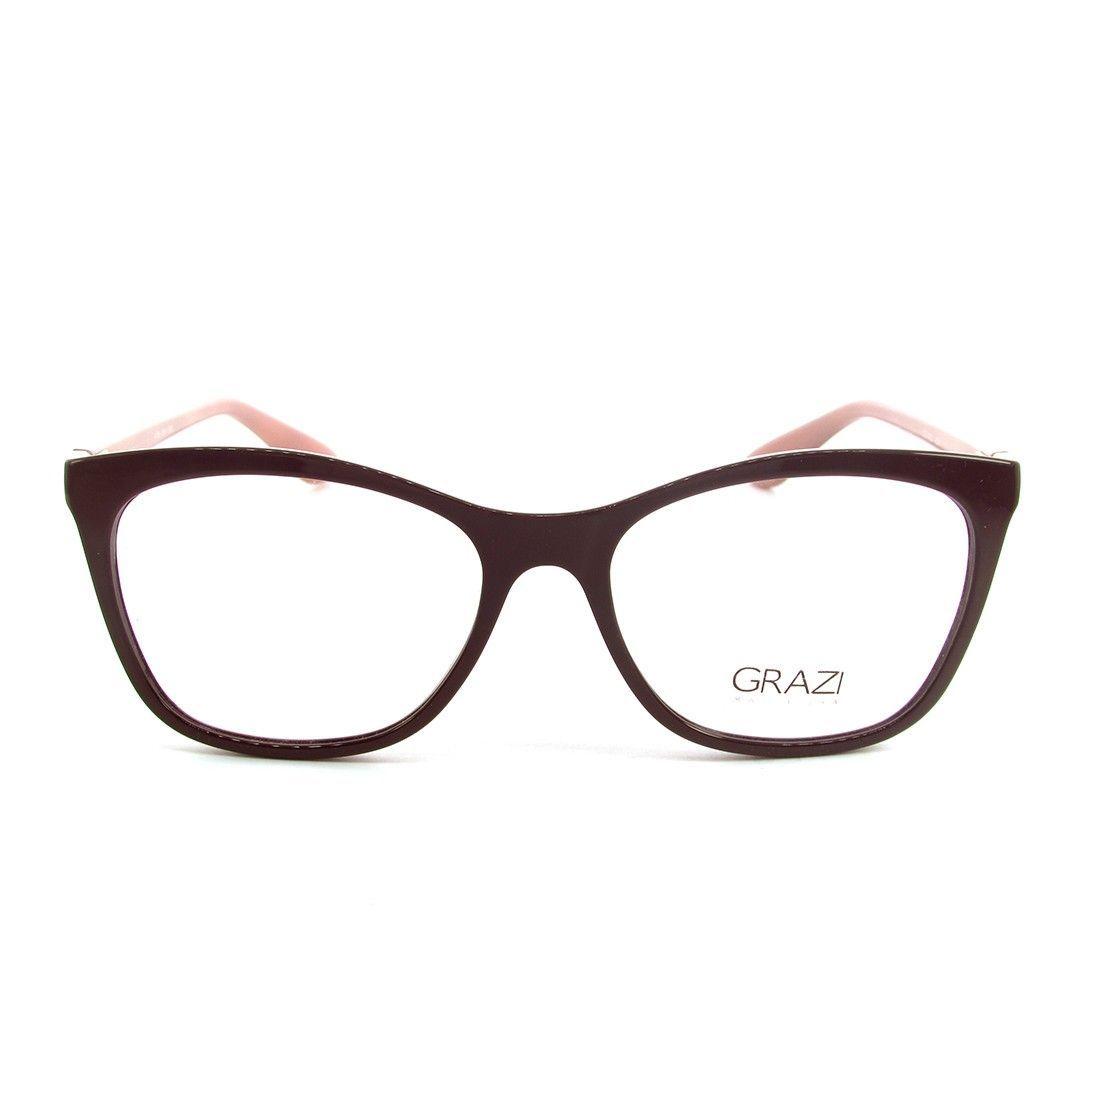 b58167fad Óculos de Grau Grazi Massafera | Óculos de Grau Grazi Massafera ...